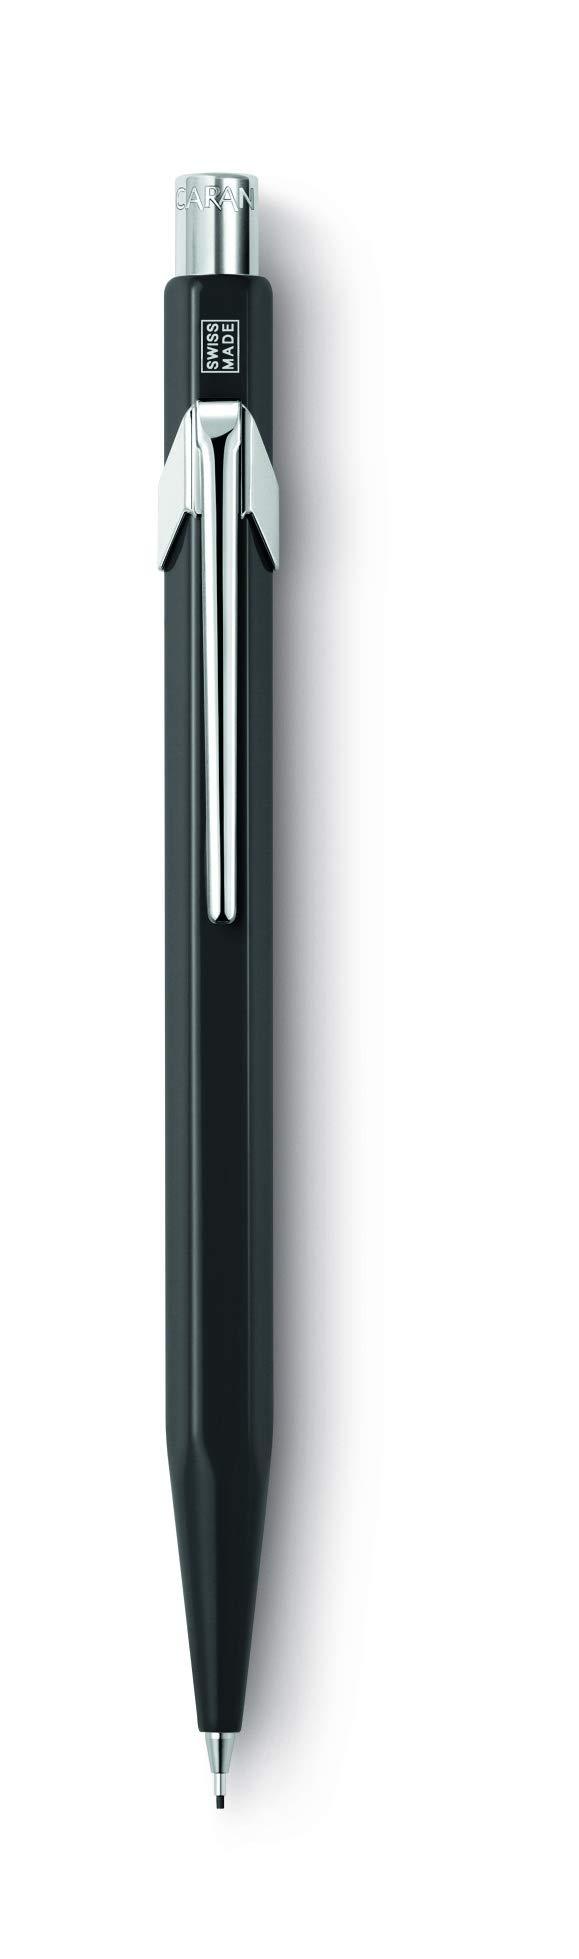 Caran Dache 844 Metal Portaminas 0.7mm - Negro (844.009)